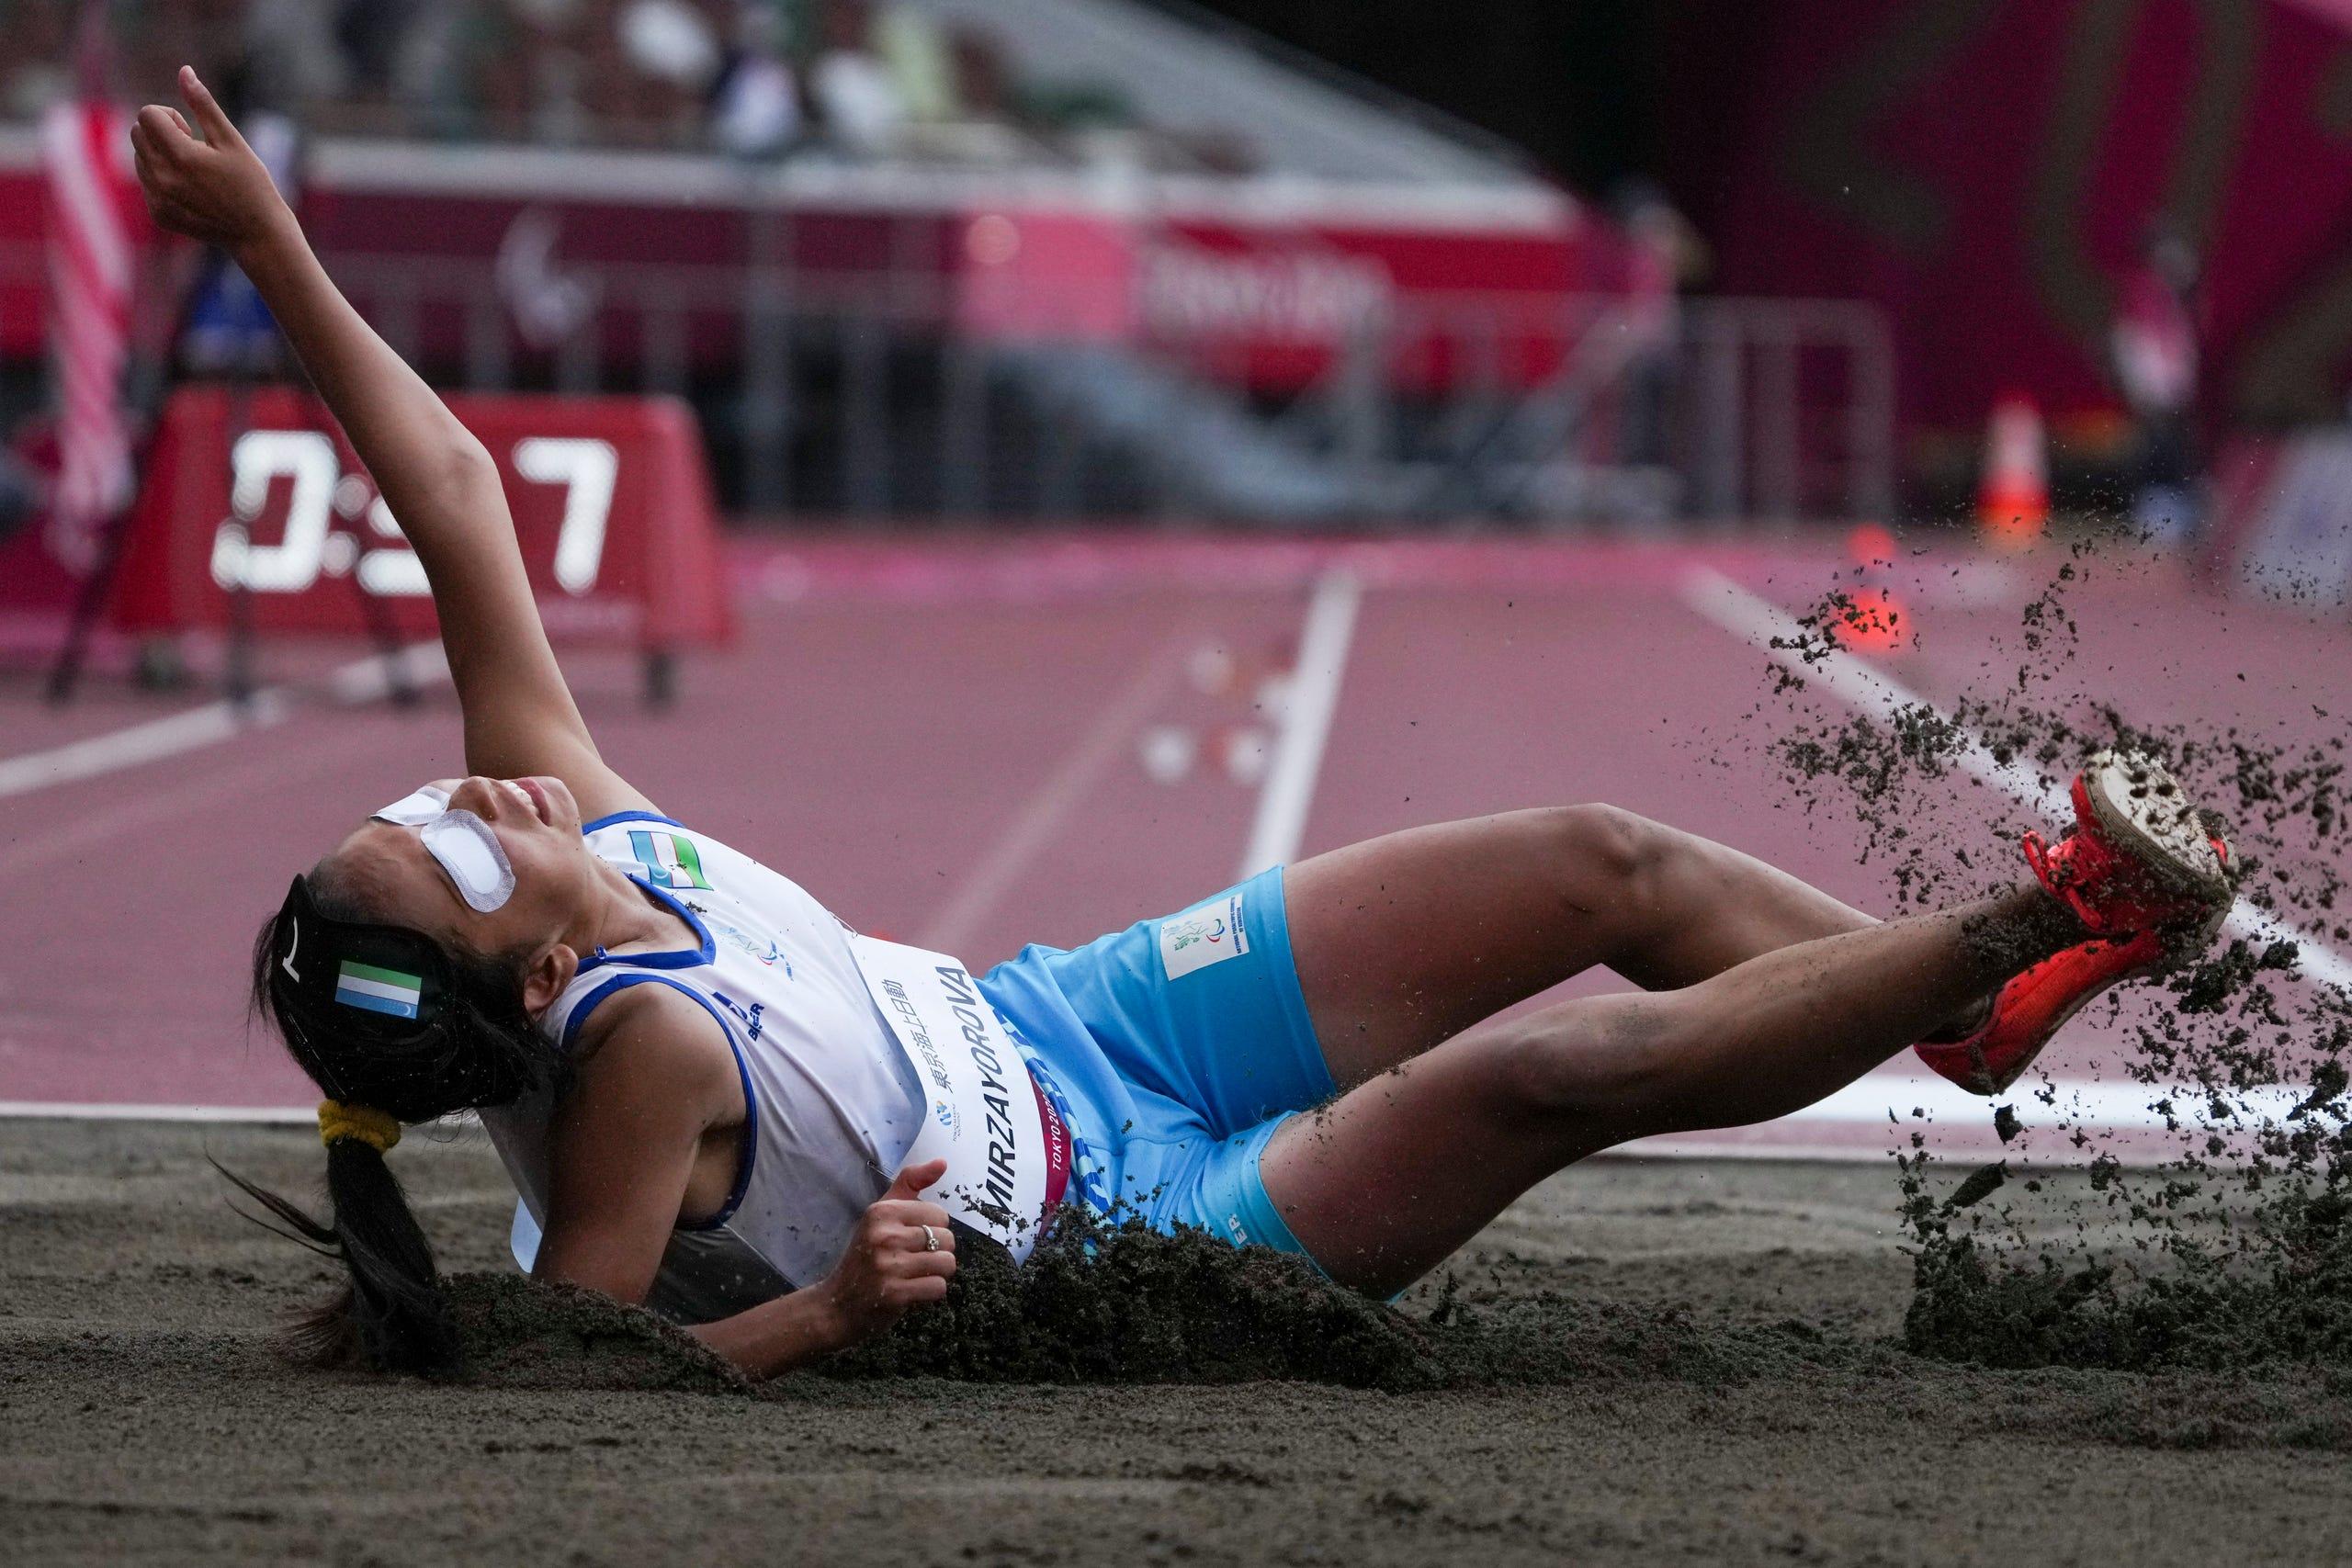 August 27, 2021: Asila Mirzayorova of Uzbekistan competes in the women's T11 long jump.